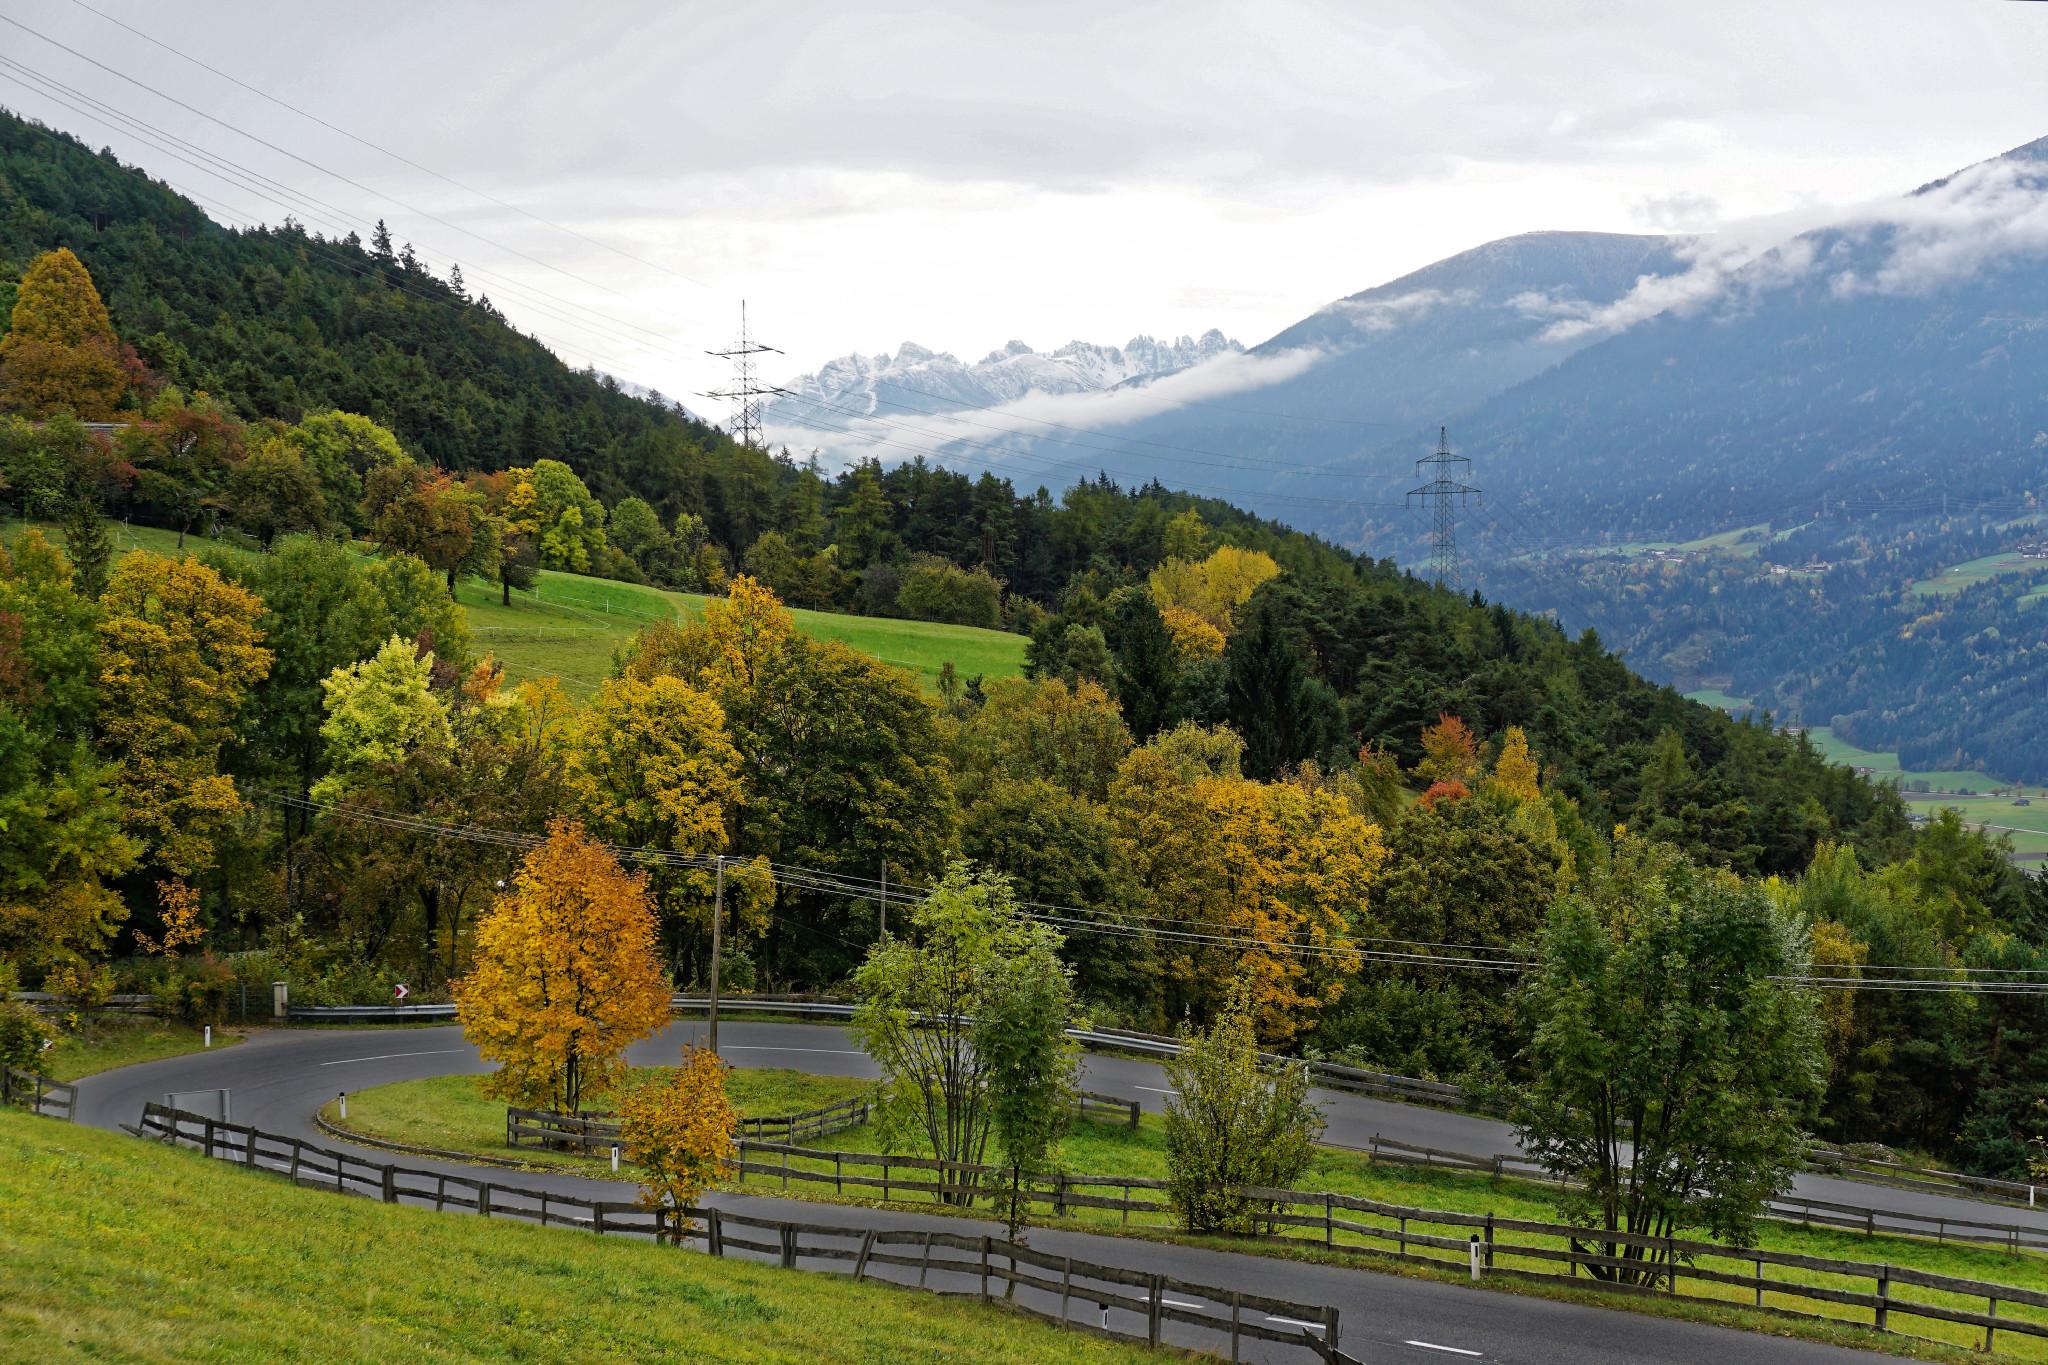 Fahrtraining in den Bergen